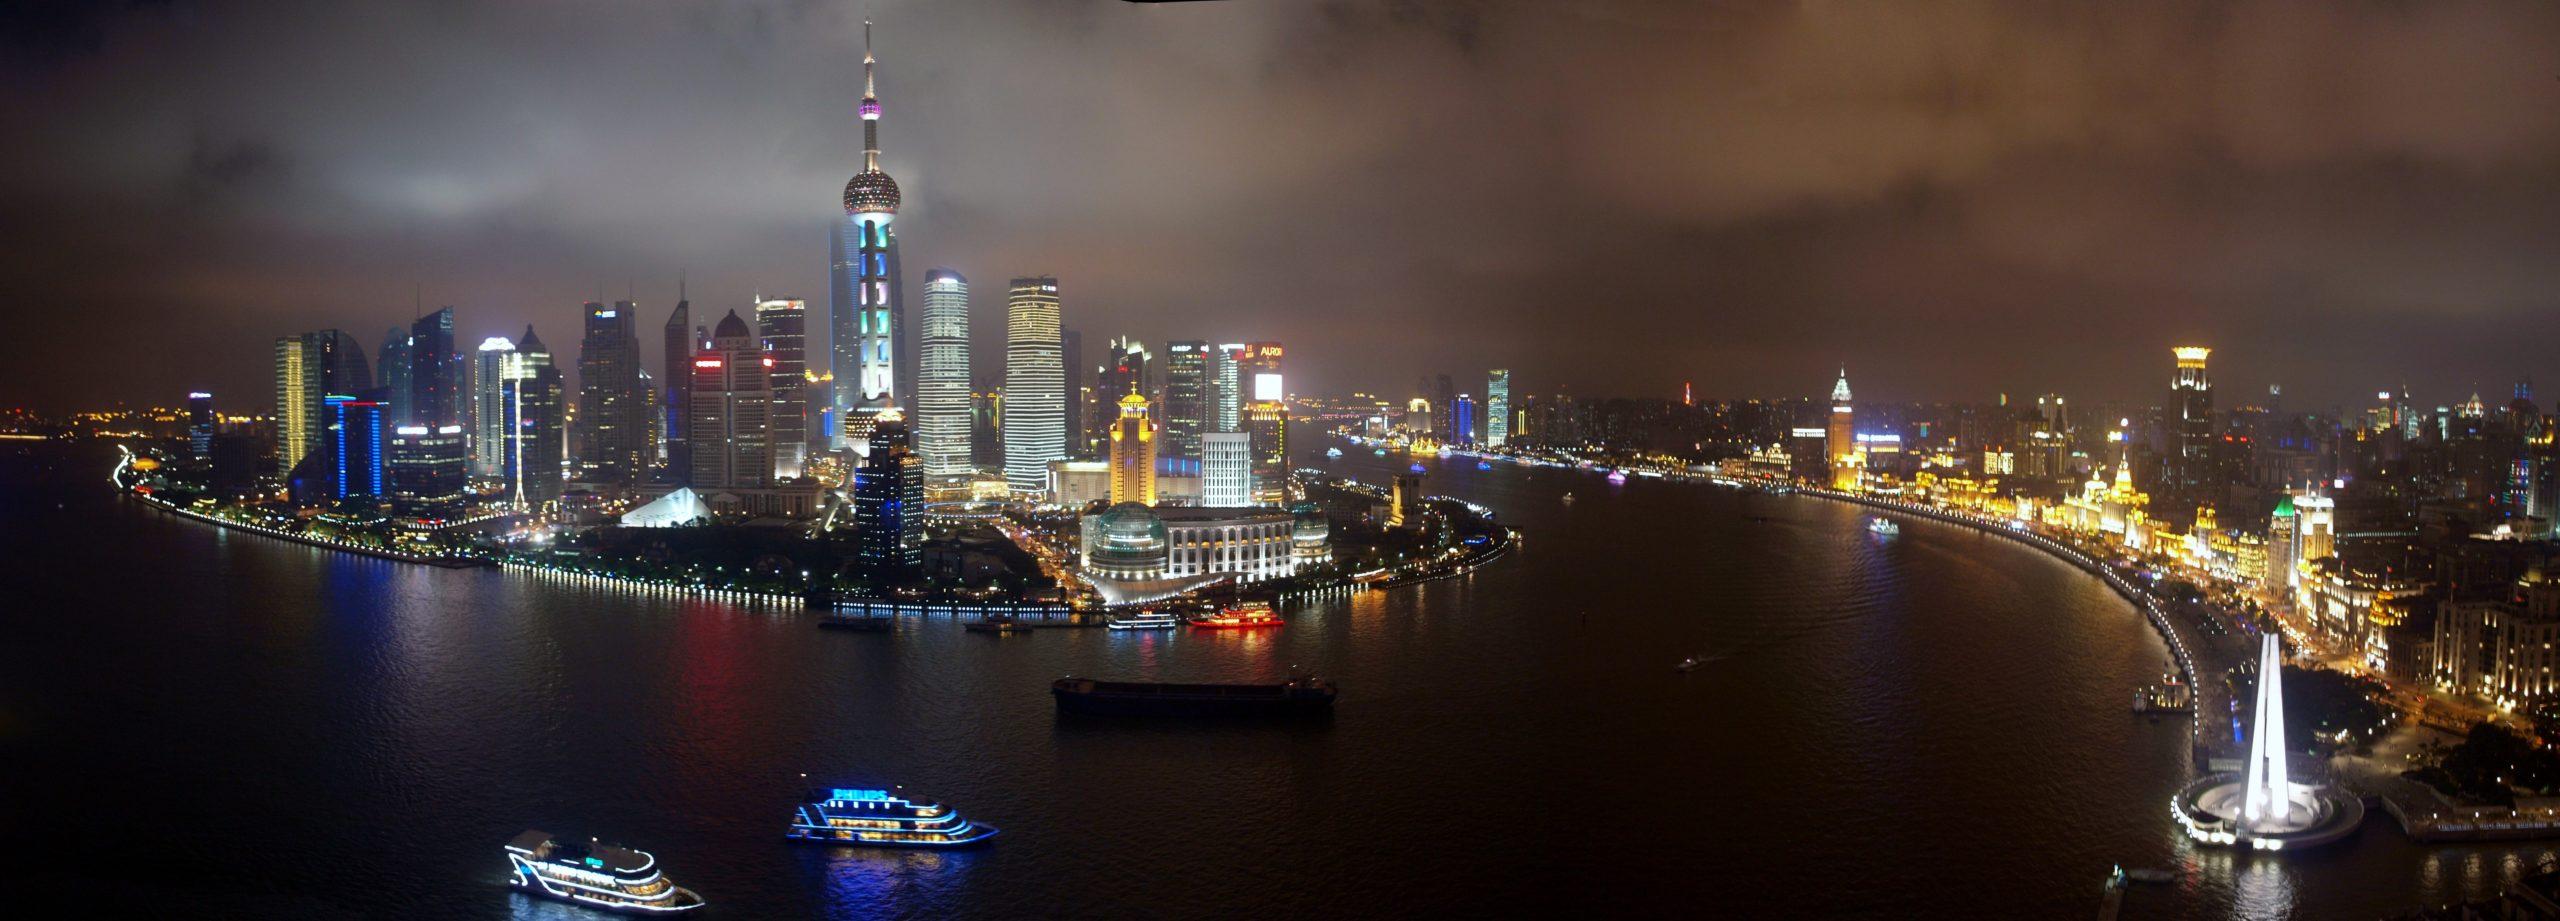 China unter der Lupe